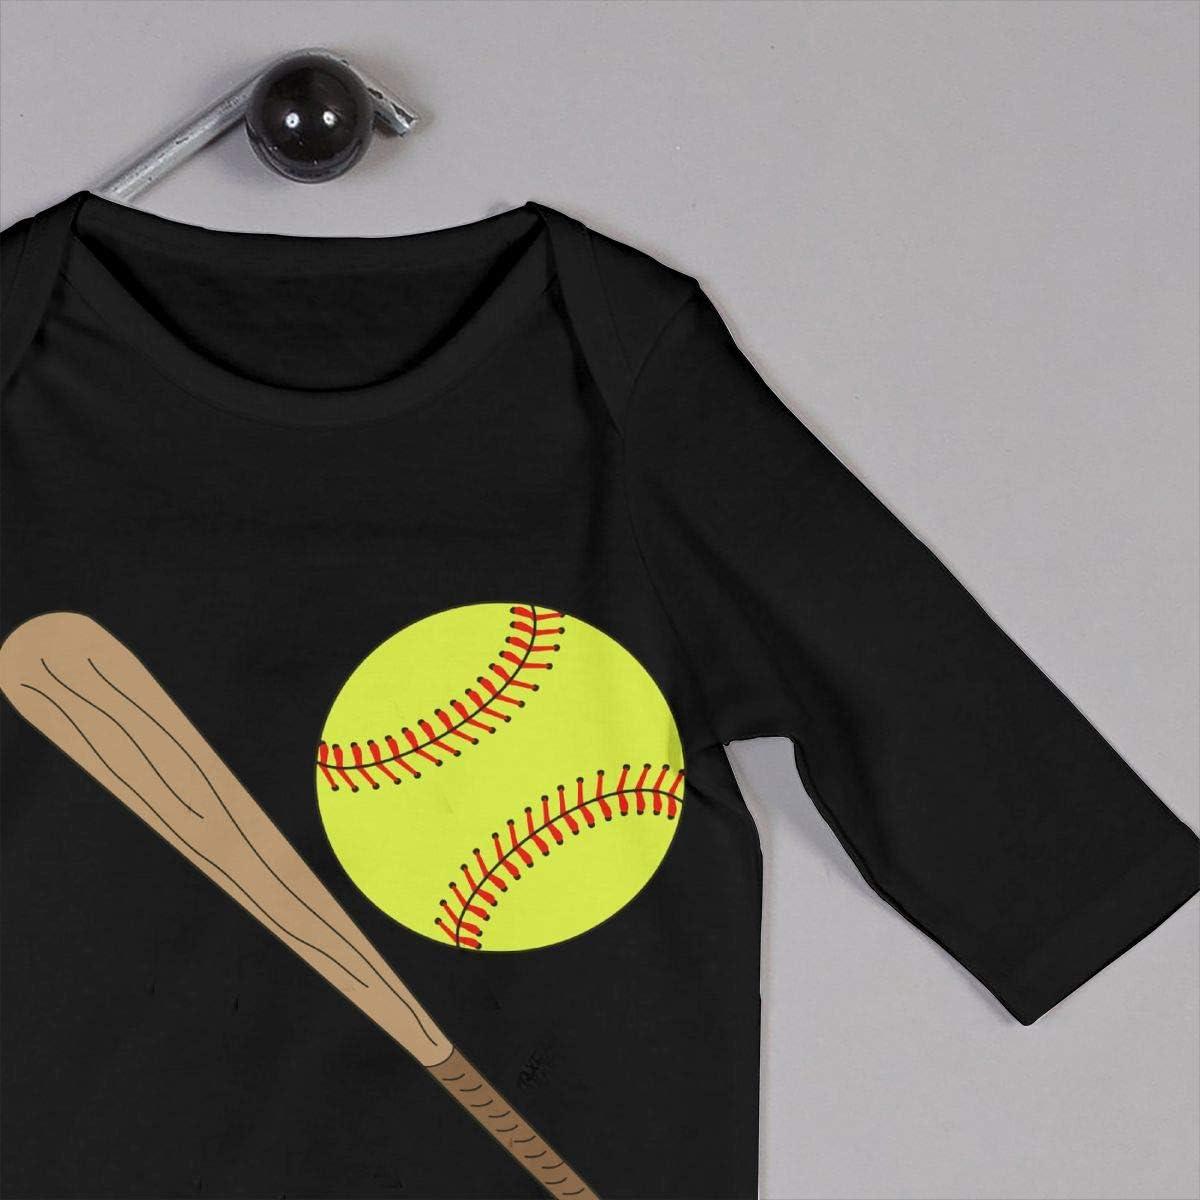 YELTY6F Softball Baseball Bat Batting Printed Newborn Infant Baby Boy Girl Jumpsuit Long Sleeve Rompers Black